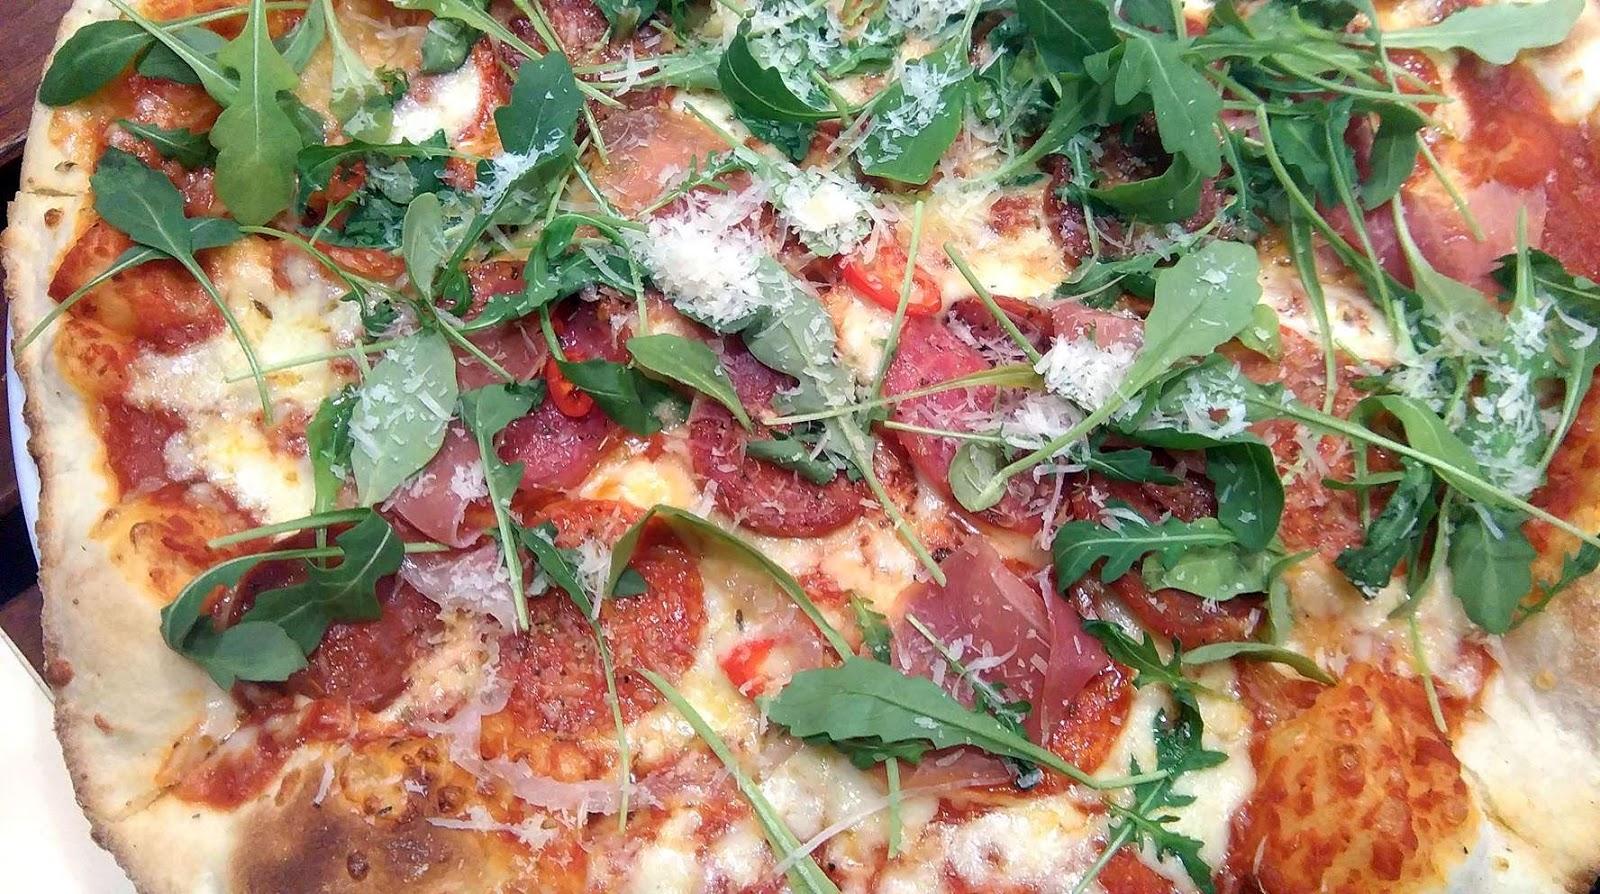 Recenzje Lubelskich Fastfoodow Pizza Kebab Lublin Kuchnia Wloska Corrado Italiano Lublin Pizza Posh Pepperoni